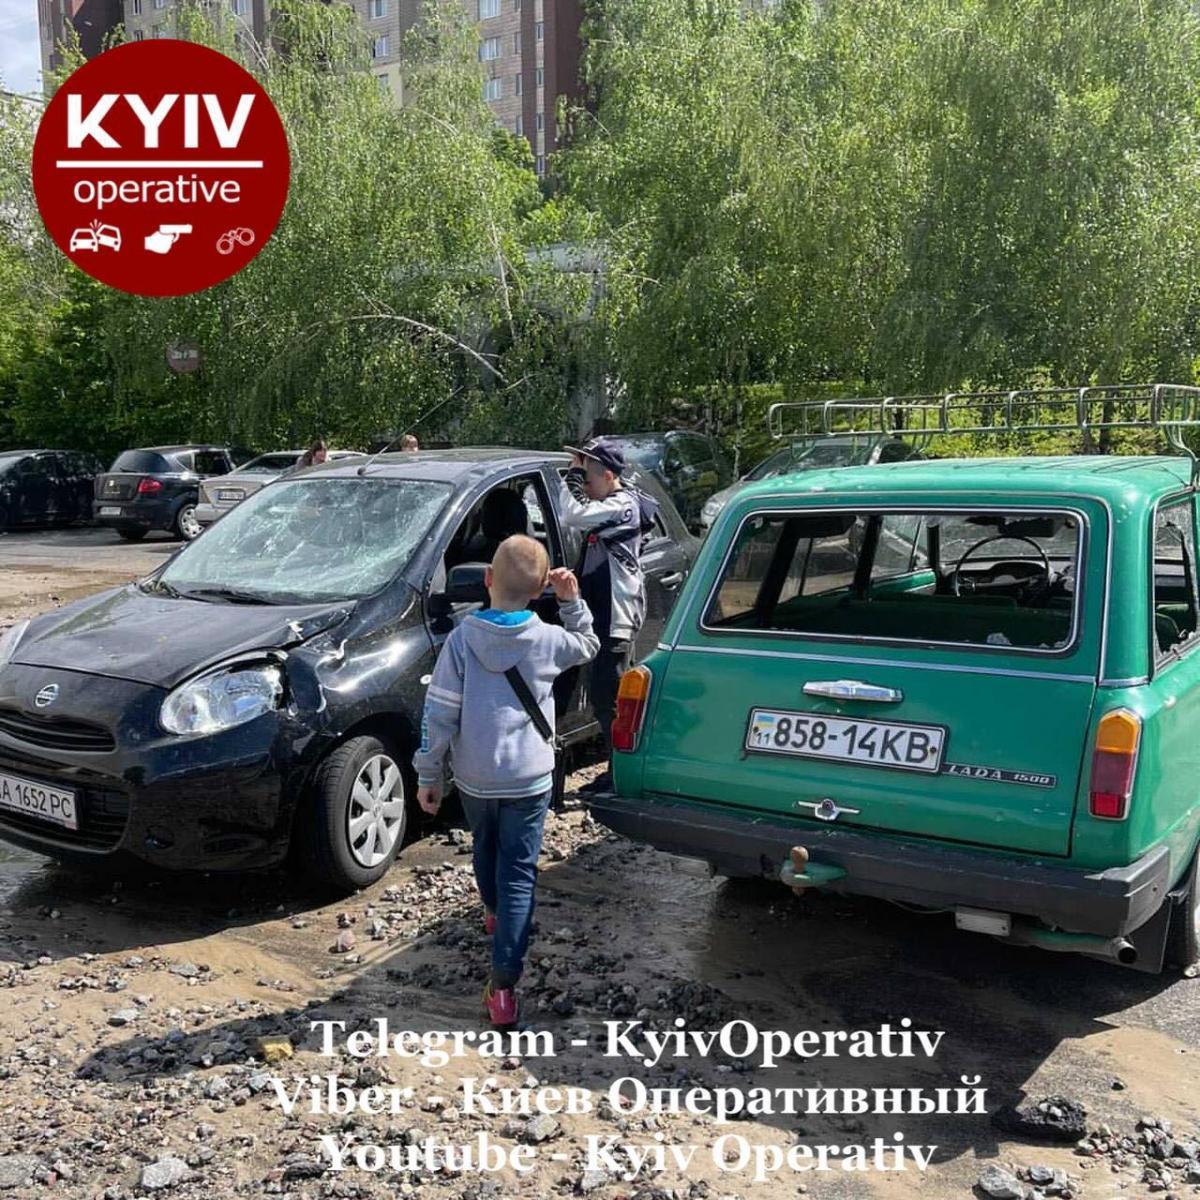 фото Киев Оперативный1